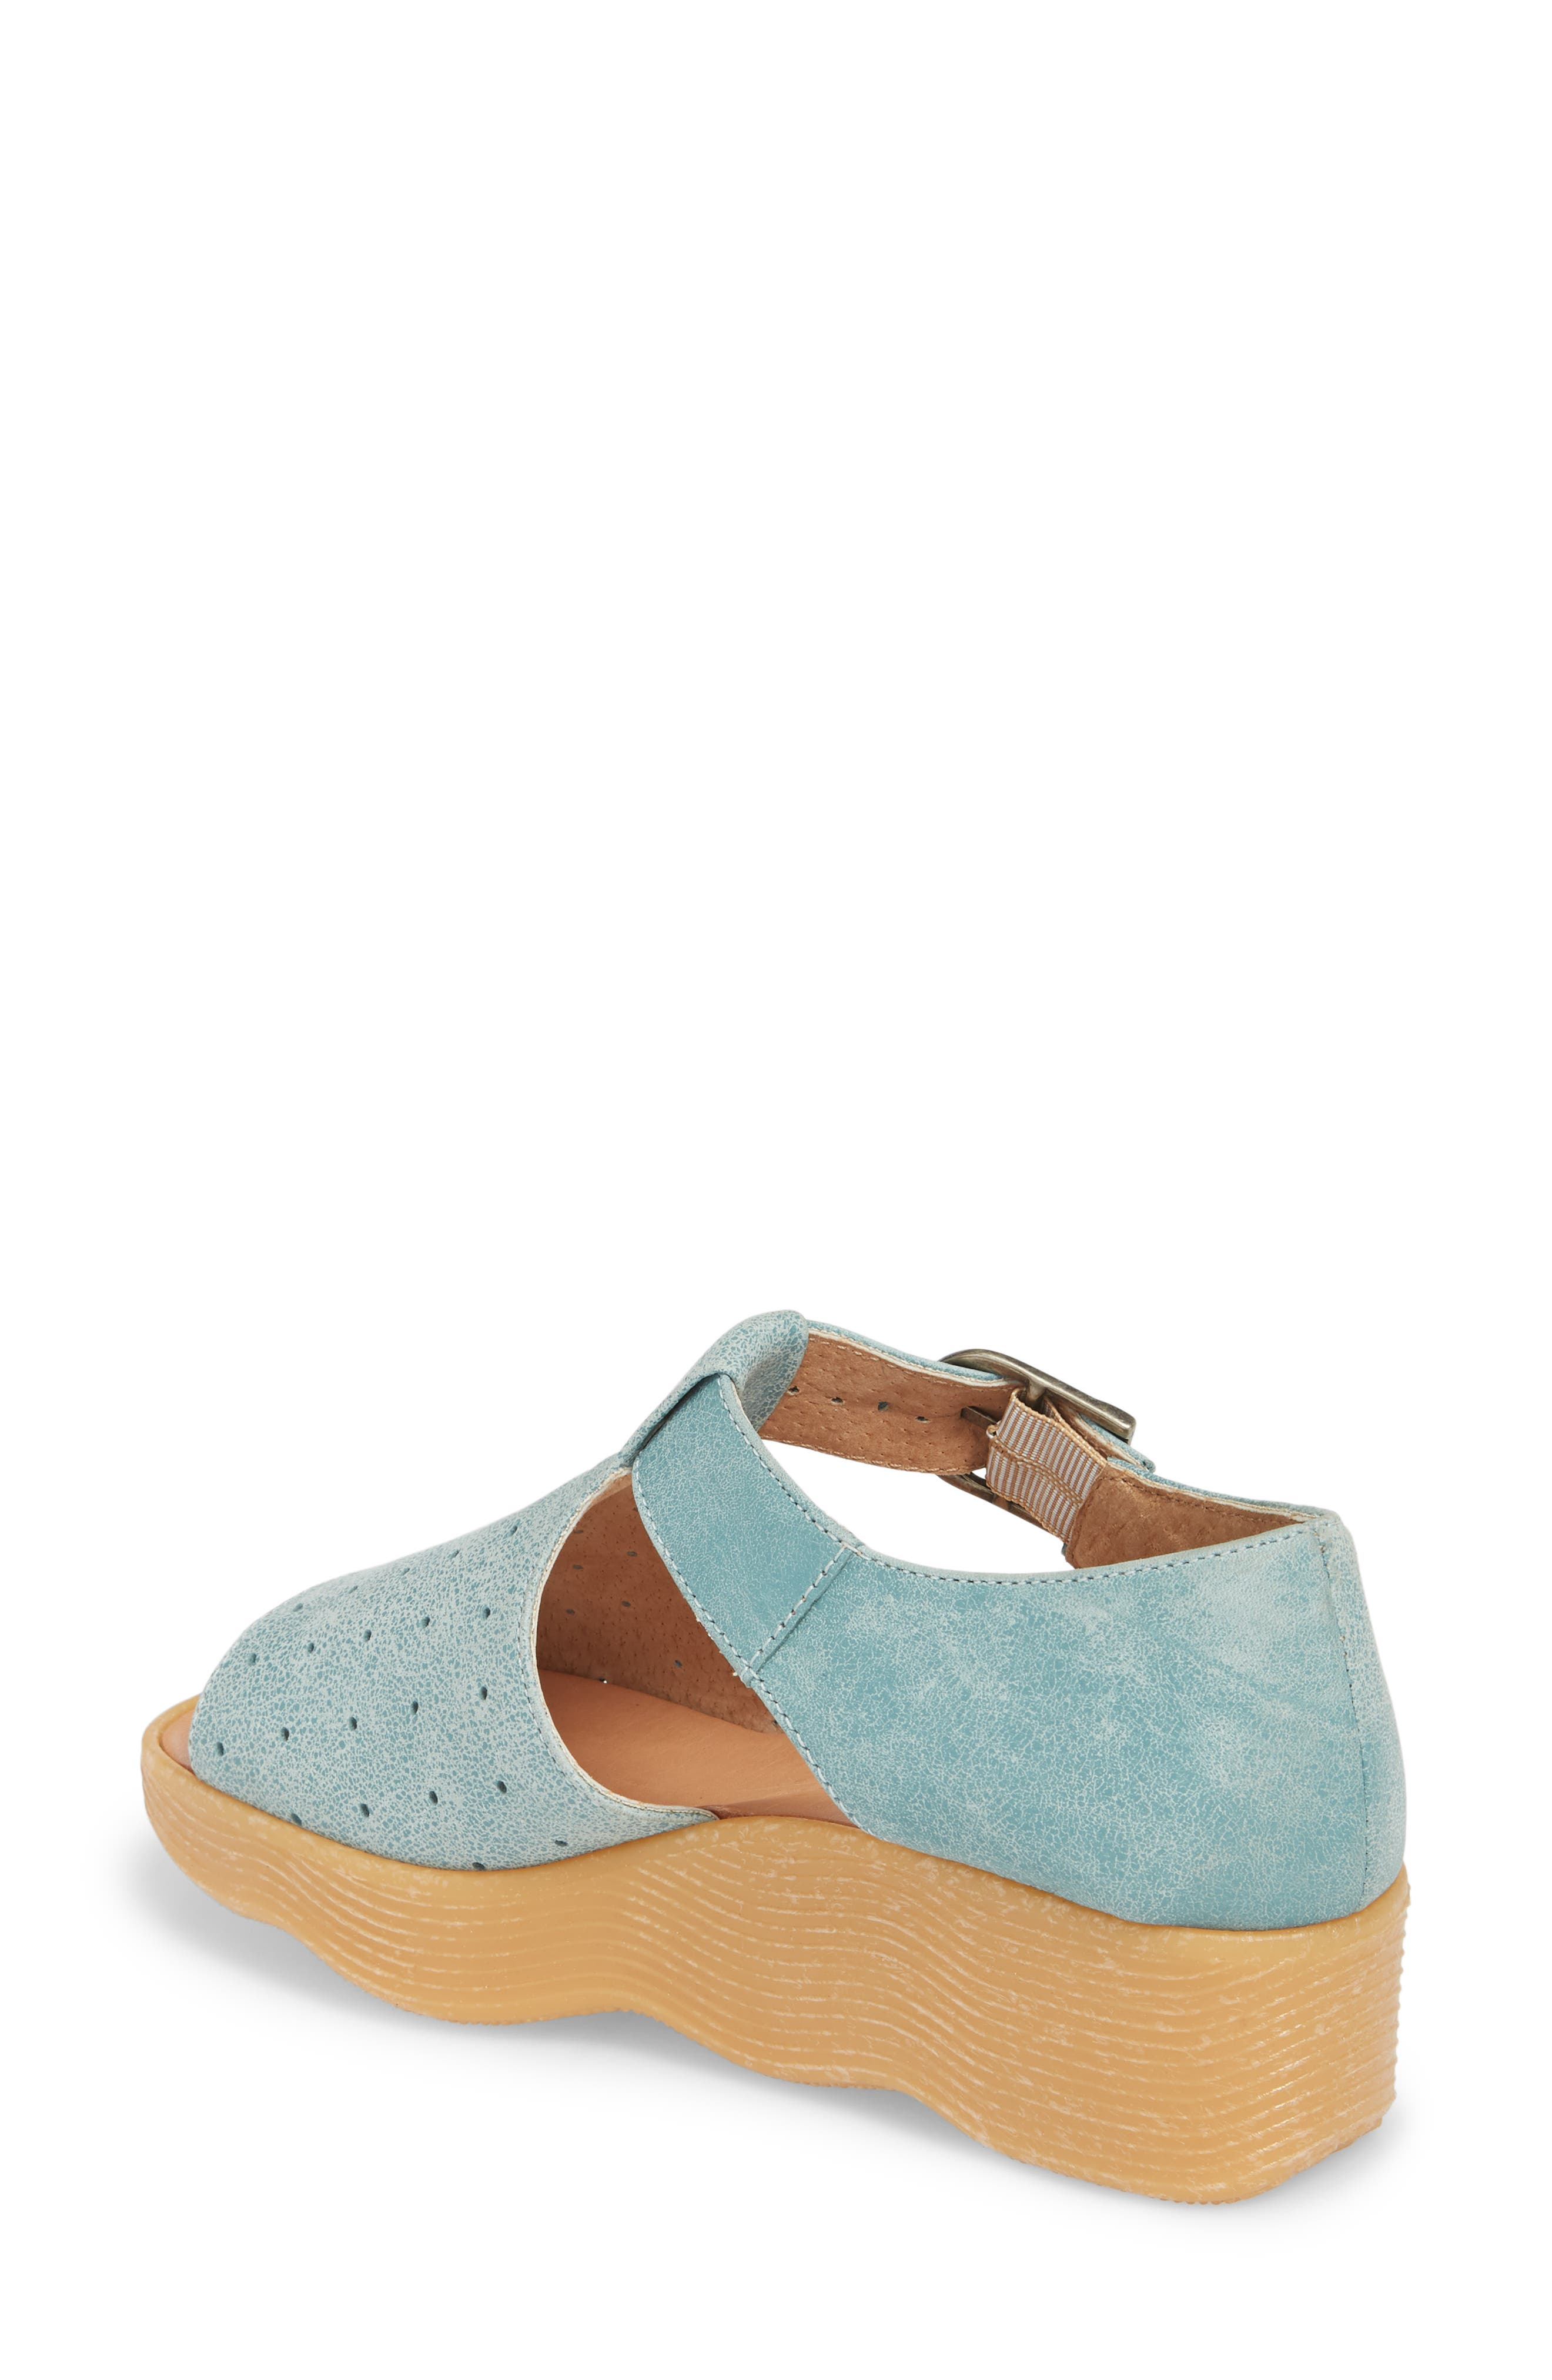 Holey Moley Wedge Sandal,                             Alternate thumbnail 2, color,                             Aqua Mix Leather